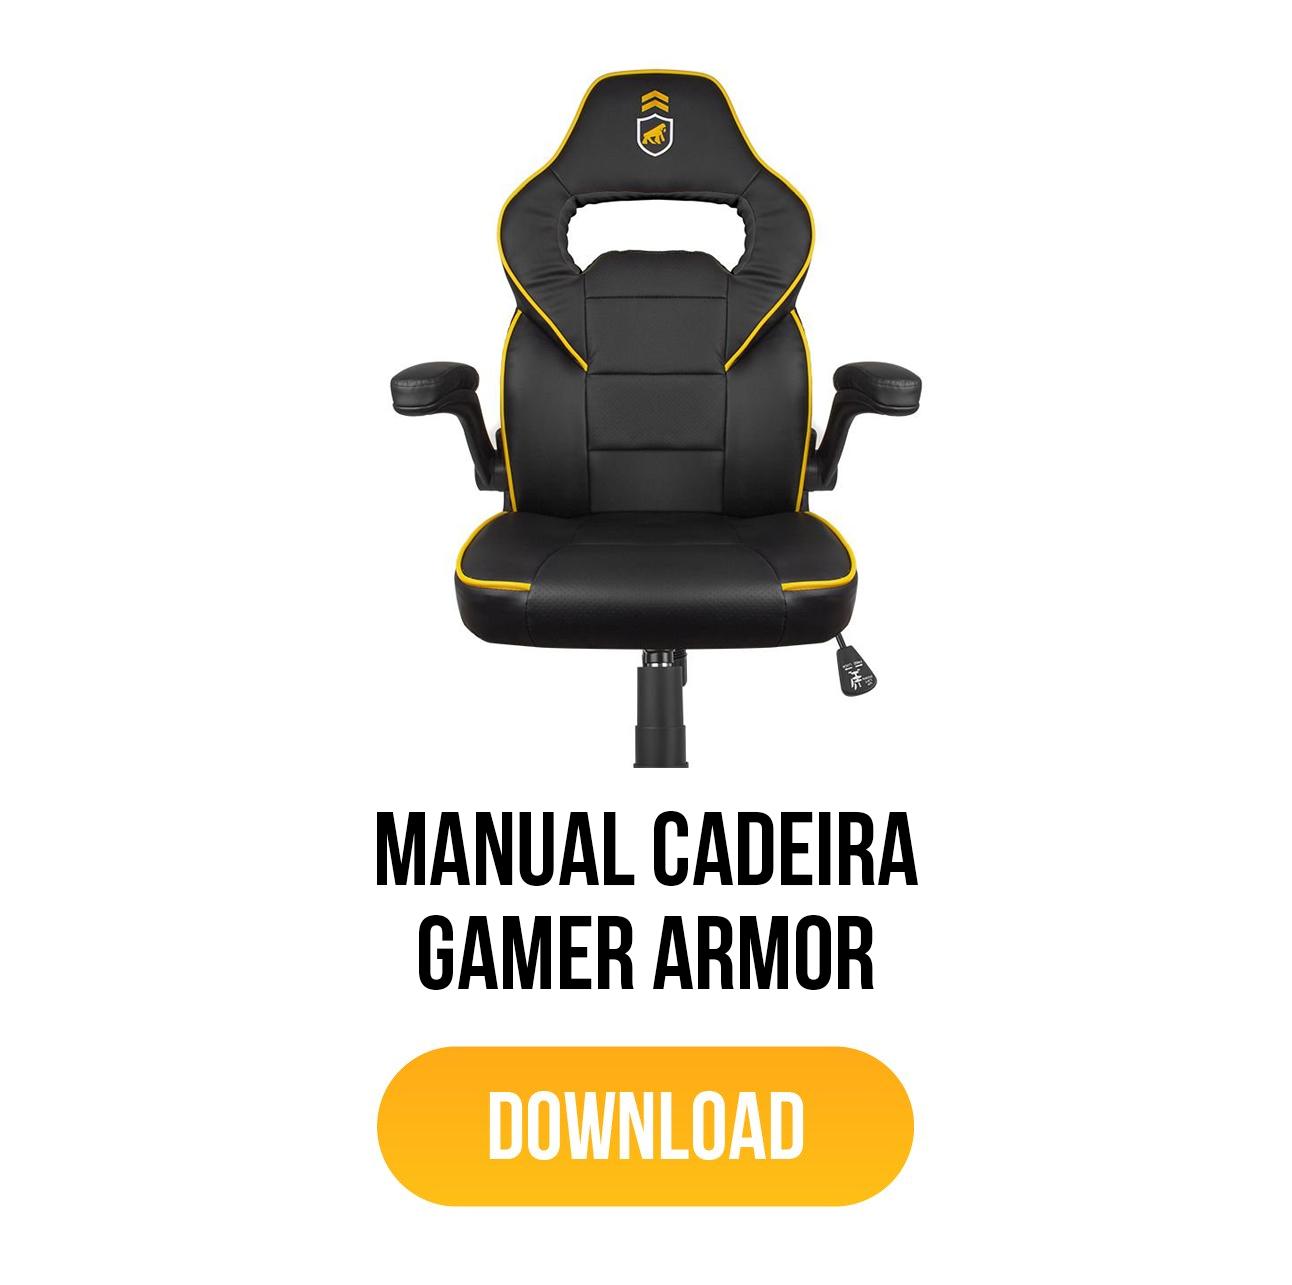 manual cadeira gamer armor